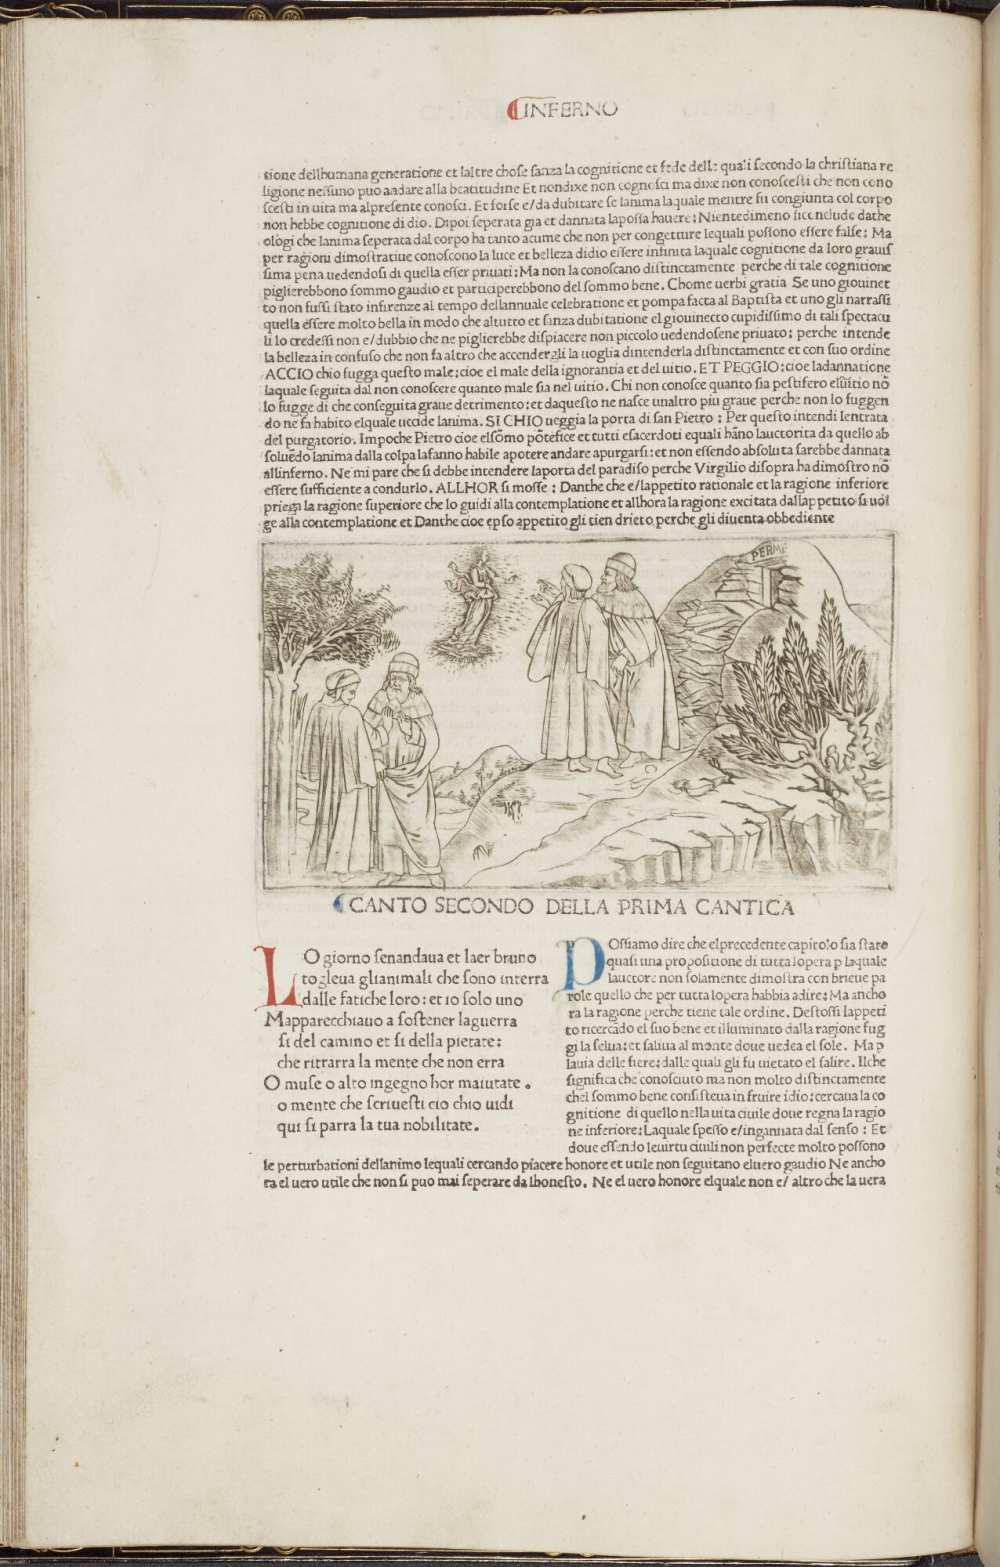 La Commedia (Comm. Cristophorus Landinus). (17280). A kép forrása: University of Manchester, Digital Collection. https://www.digitalcollections.manchester.ac.uk/view/PR-INCU-17280/52